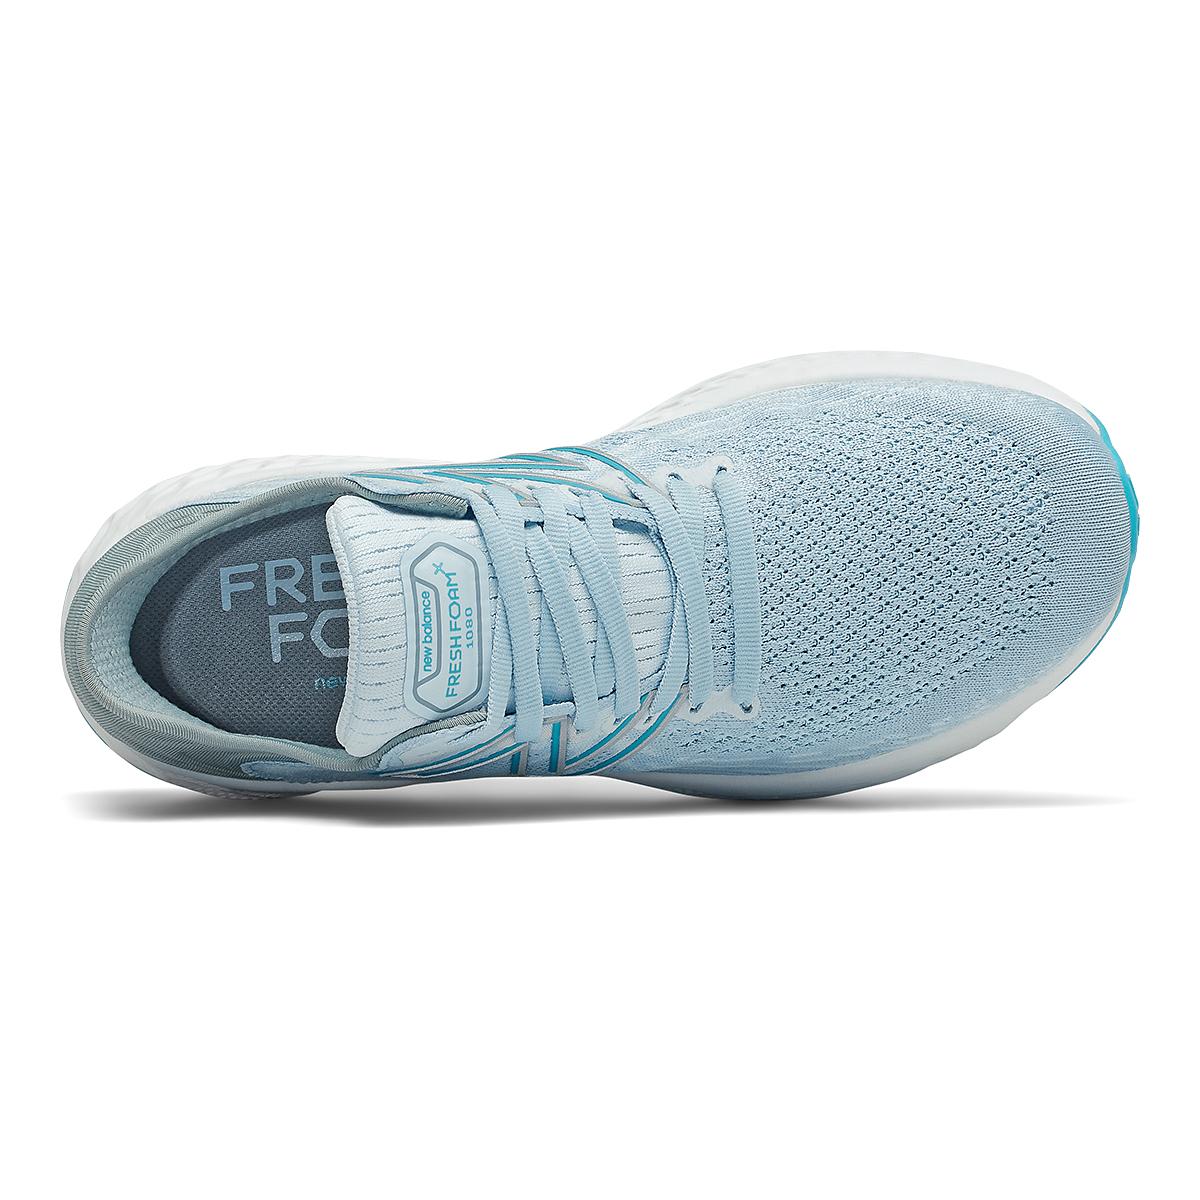 Women's New Balance 1080v11 Running Shoe - Color: Uv Glo/Star Glo - Size: 5 - Width: Extra Wide, Uv Glo/Star Glo, large, image 4